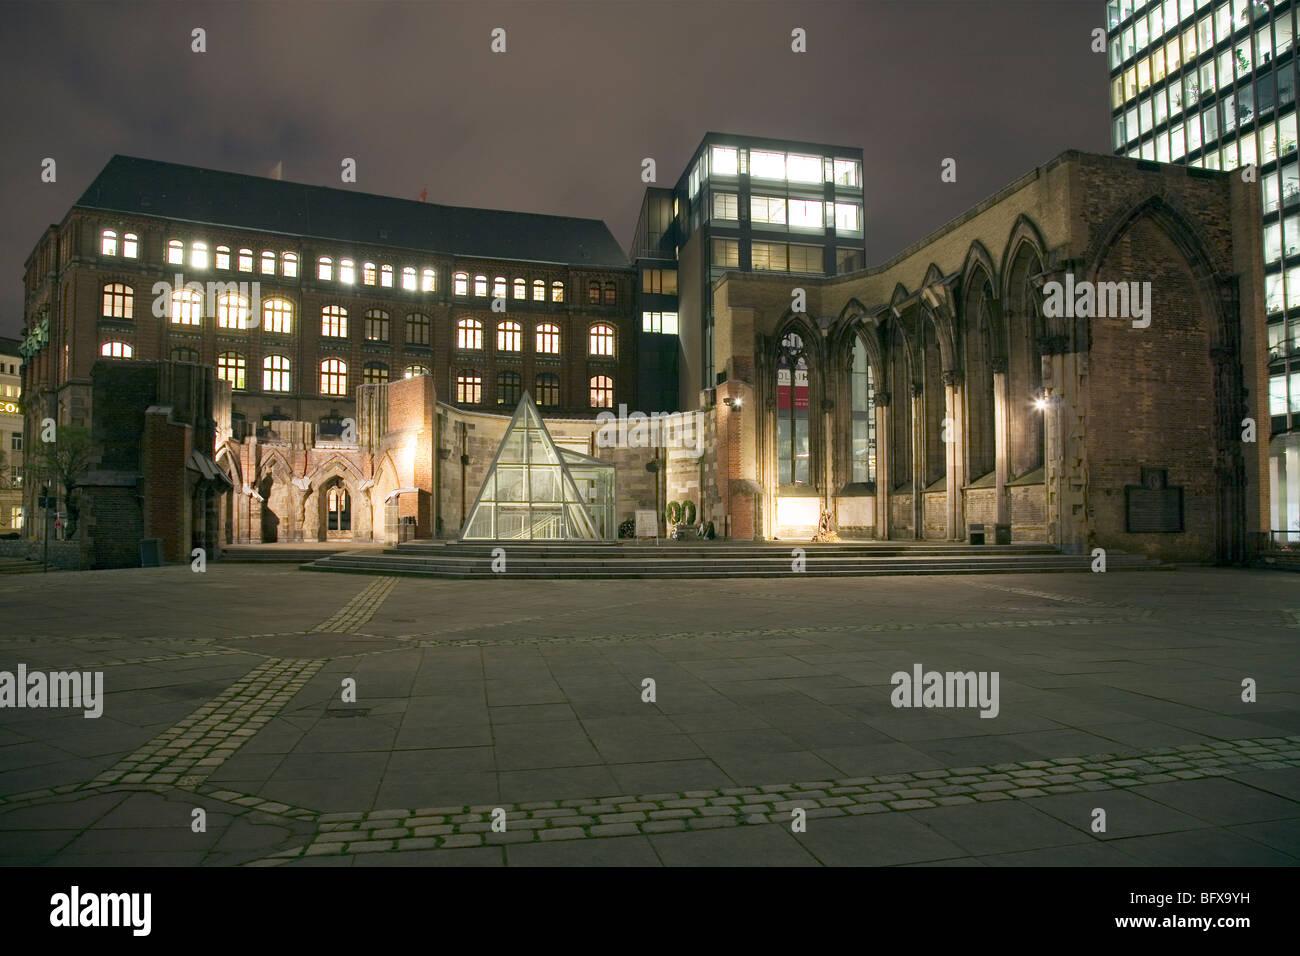 St. Nikolai Kirche, Hamburg, Germany - Stock Image